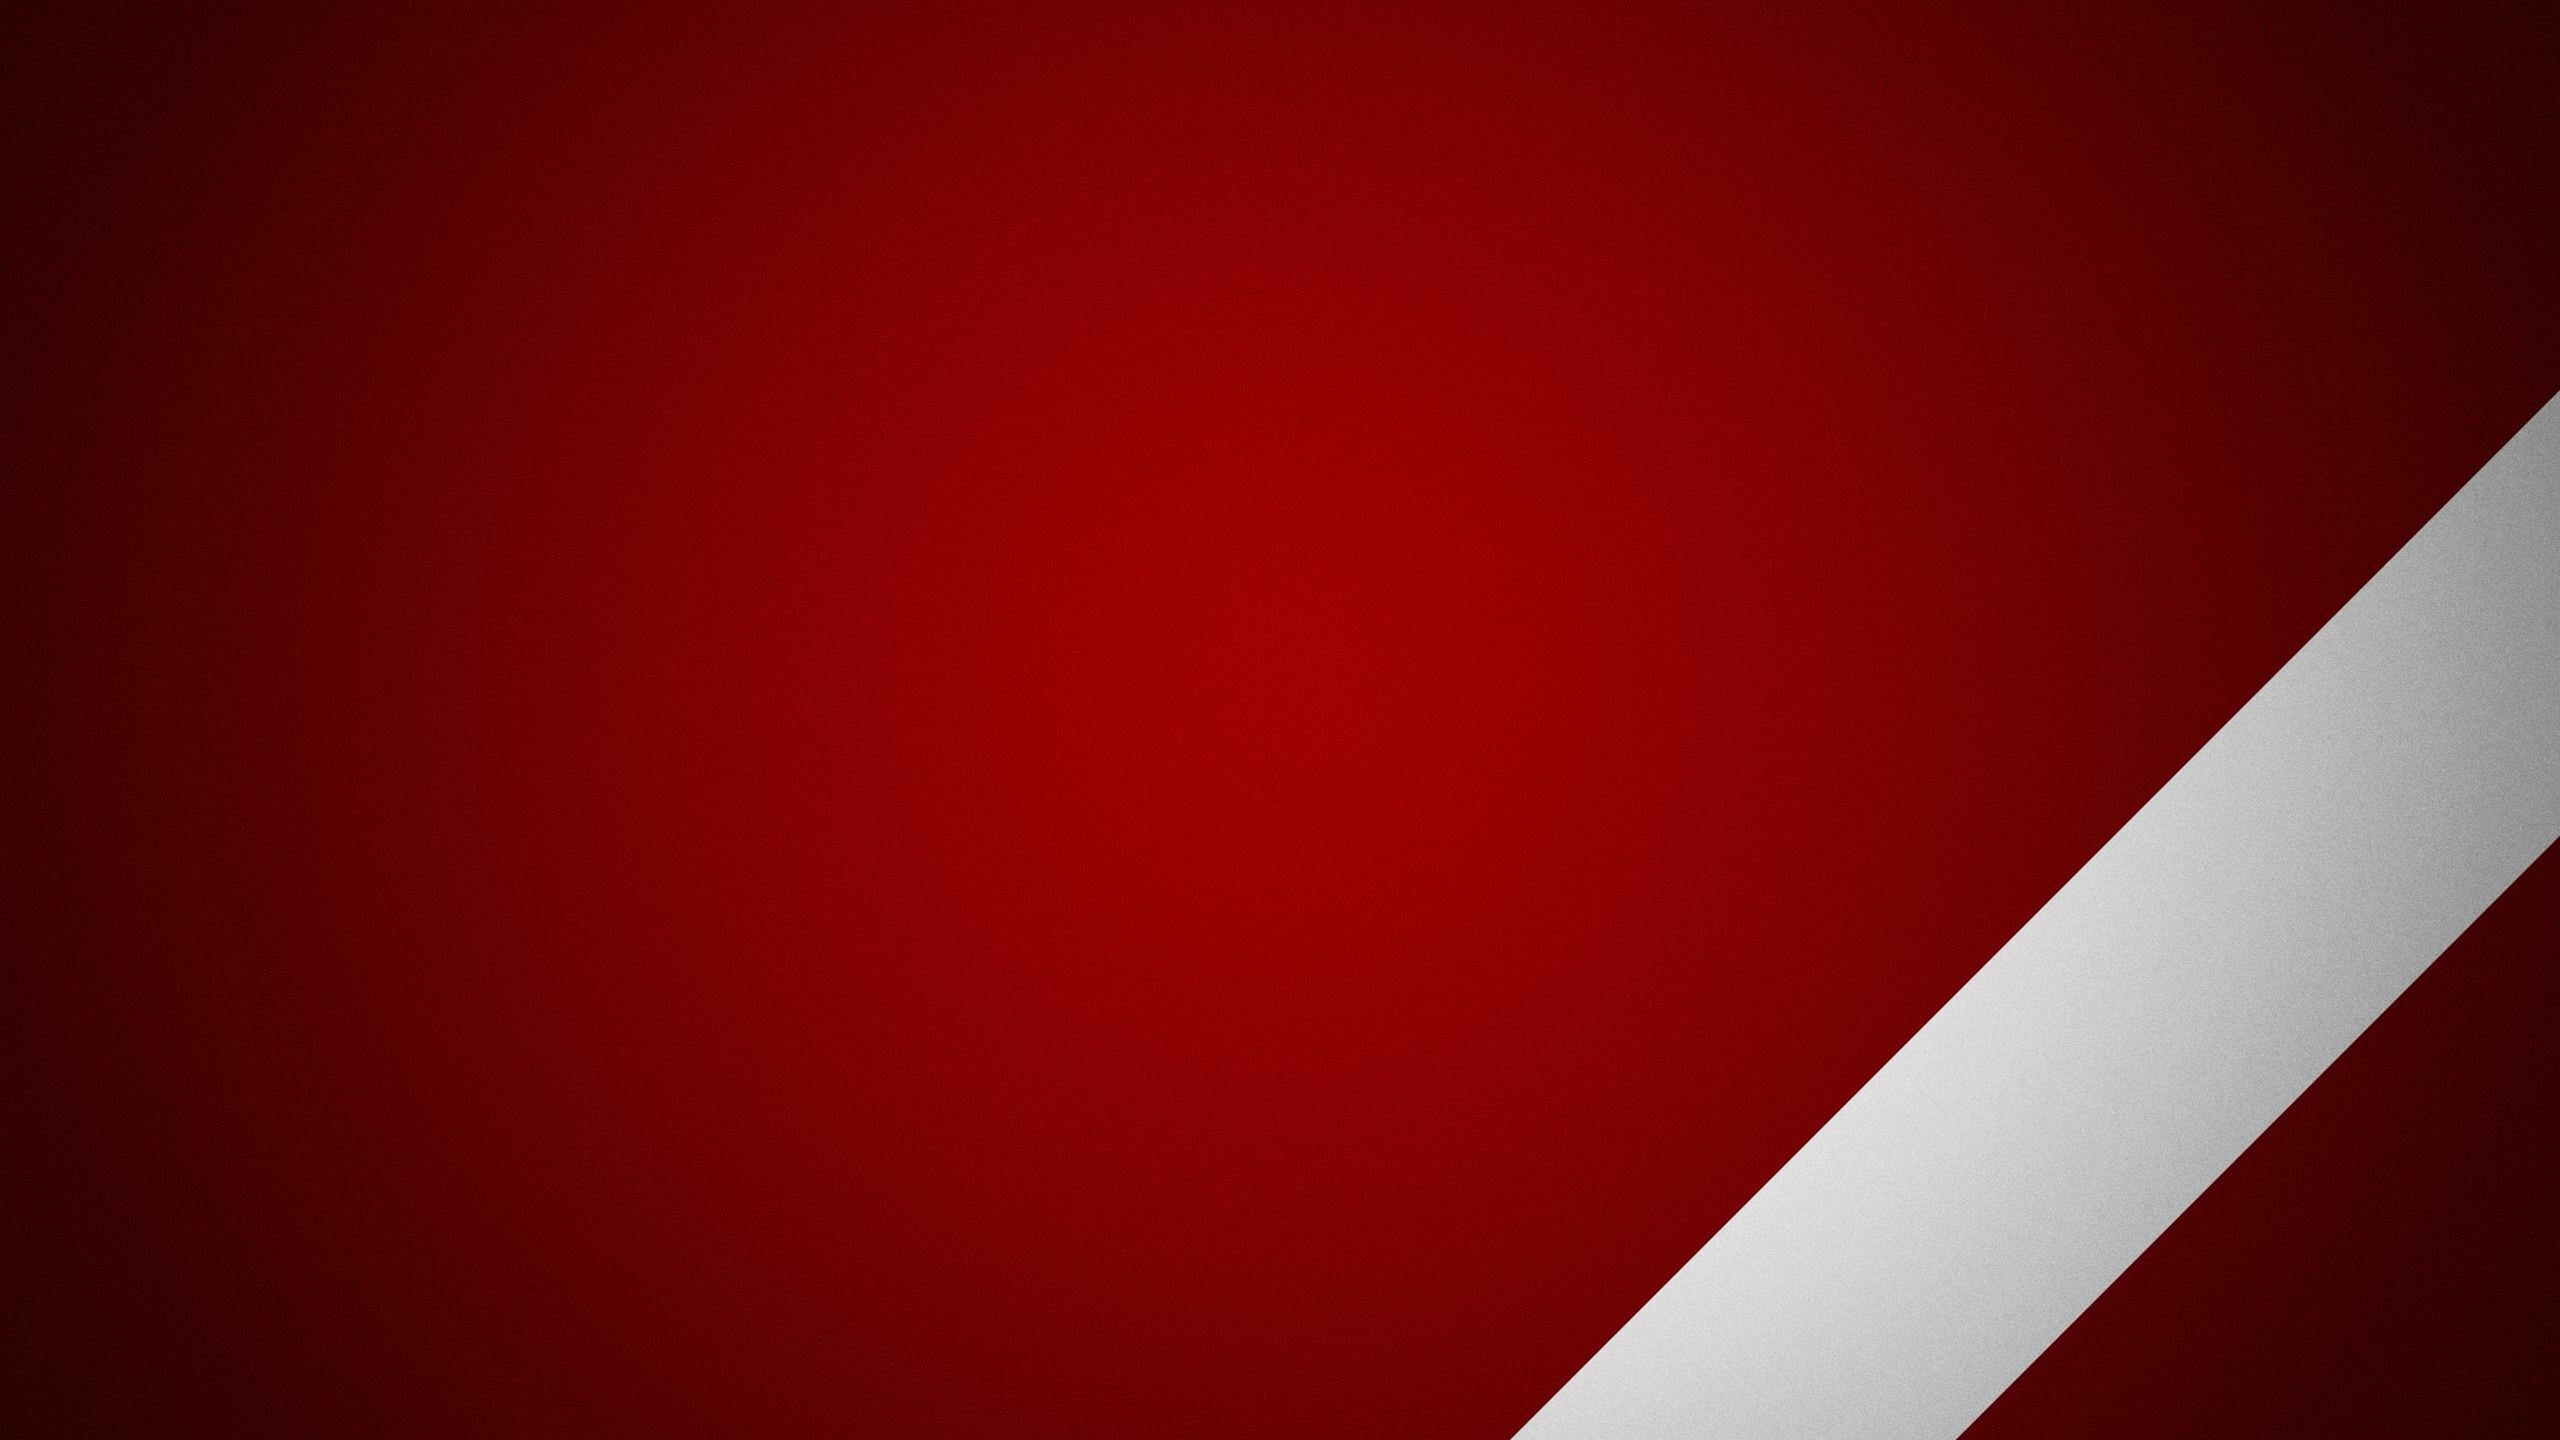 Red White Wallpaper 2560x1440 Red White 2560x1440